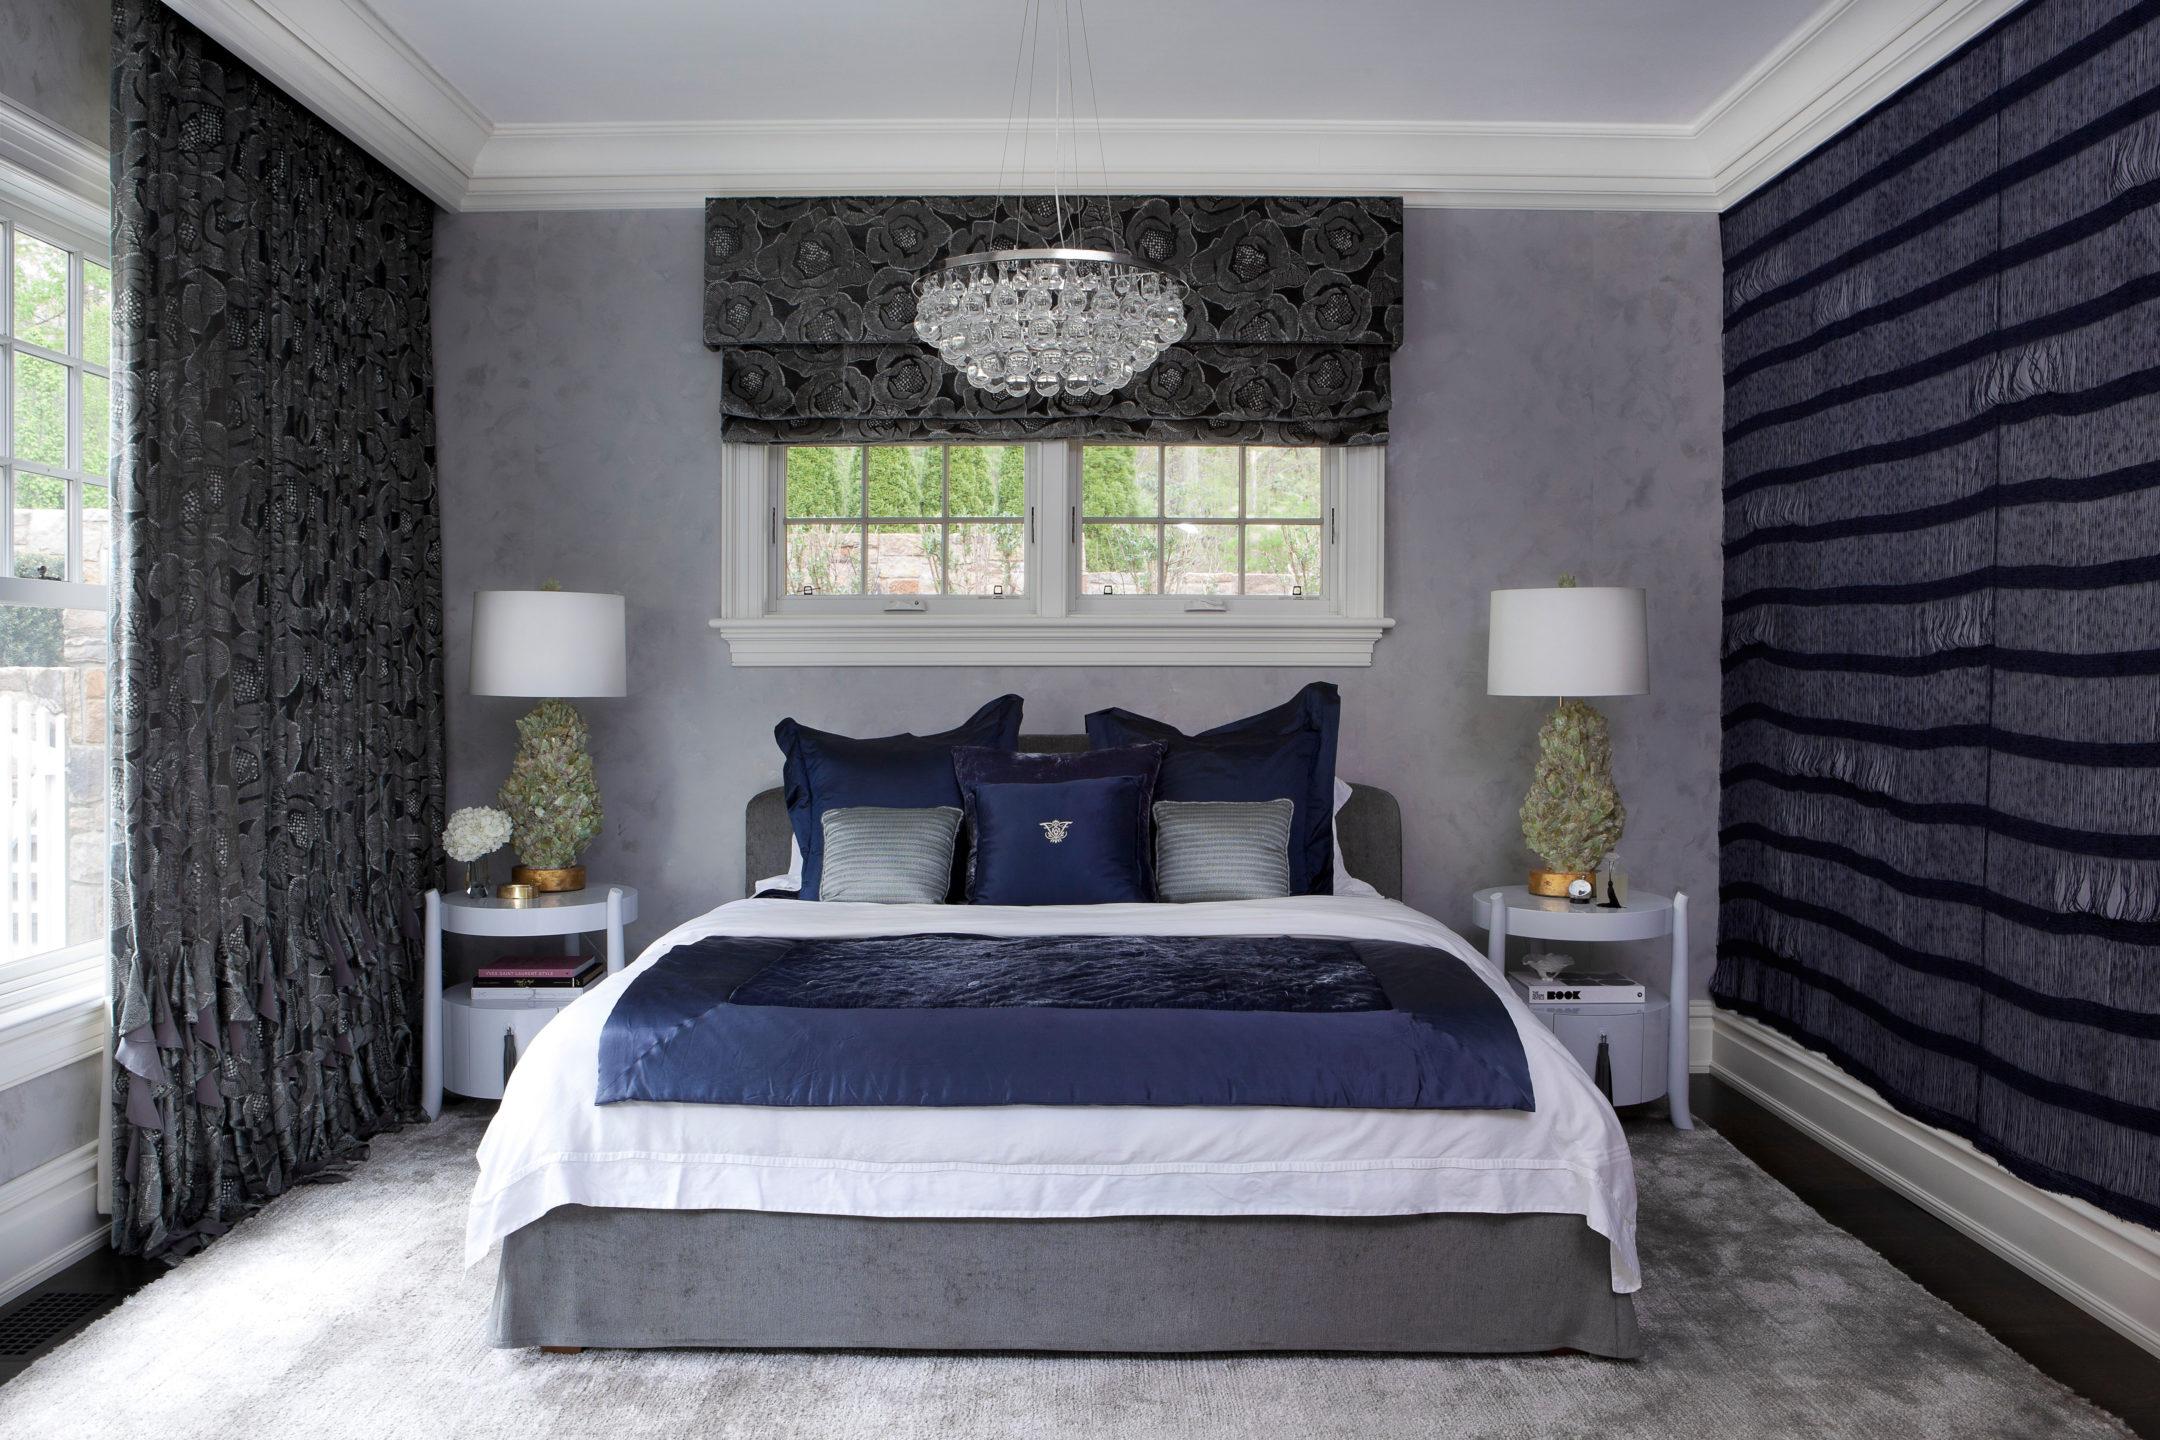 DELIGHT-nightstands-1-nicole-fuller-product-information